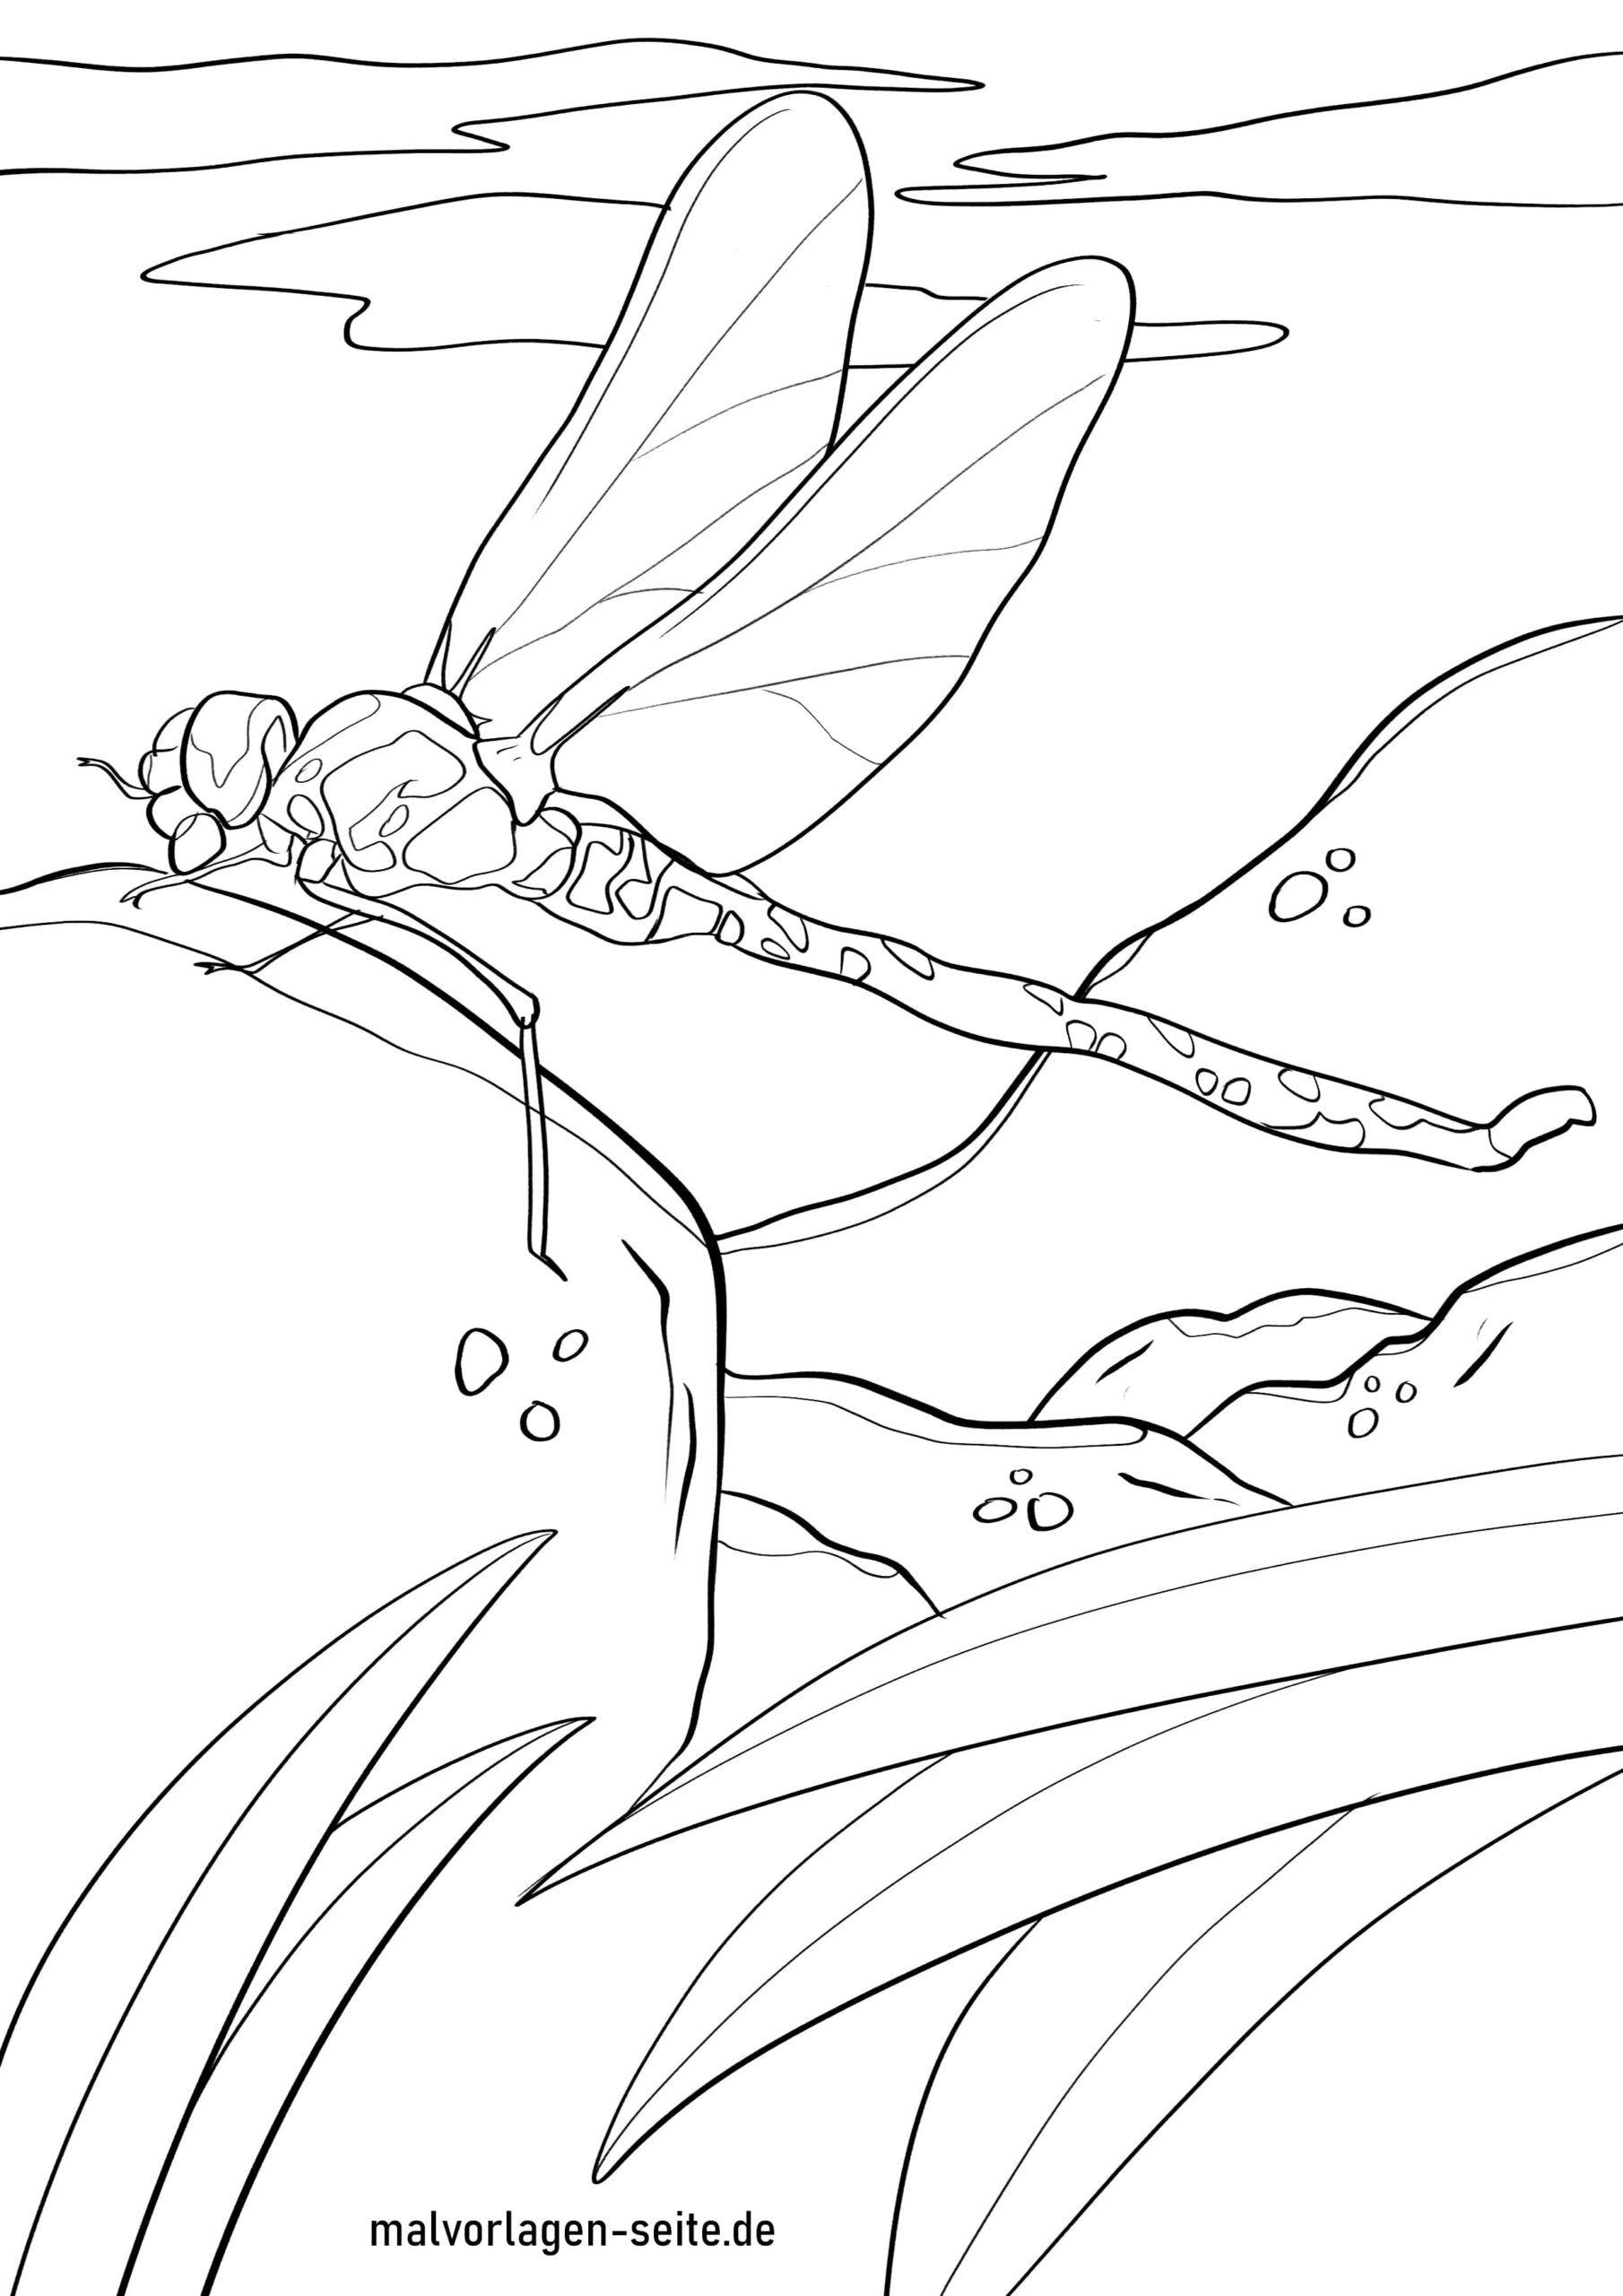 Tolle Malvorlage Libelle - Insekten - Kostenlose Ausmalbilder